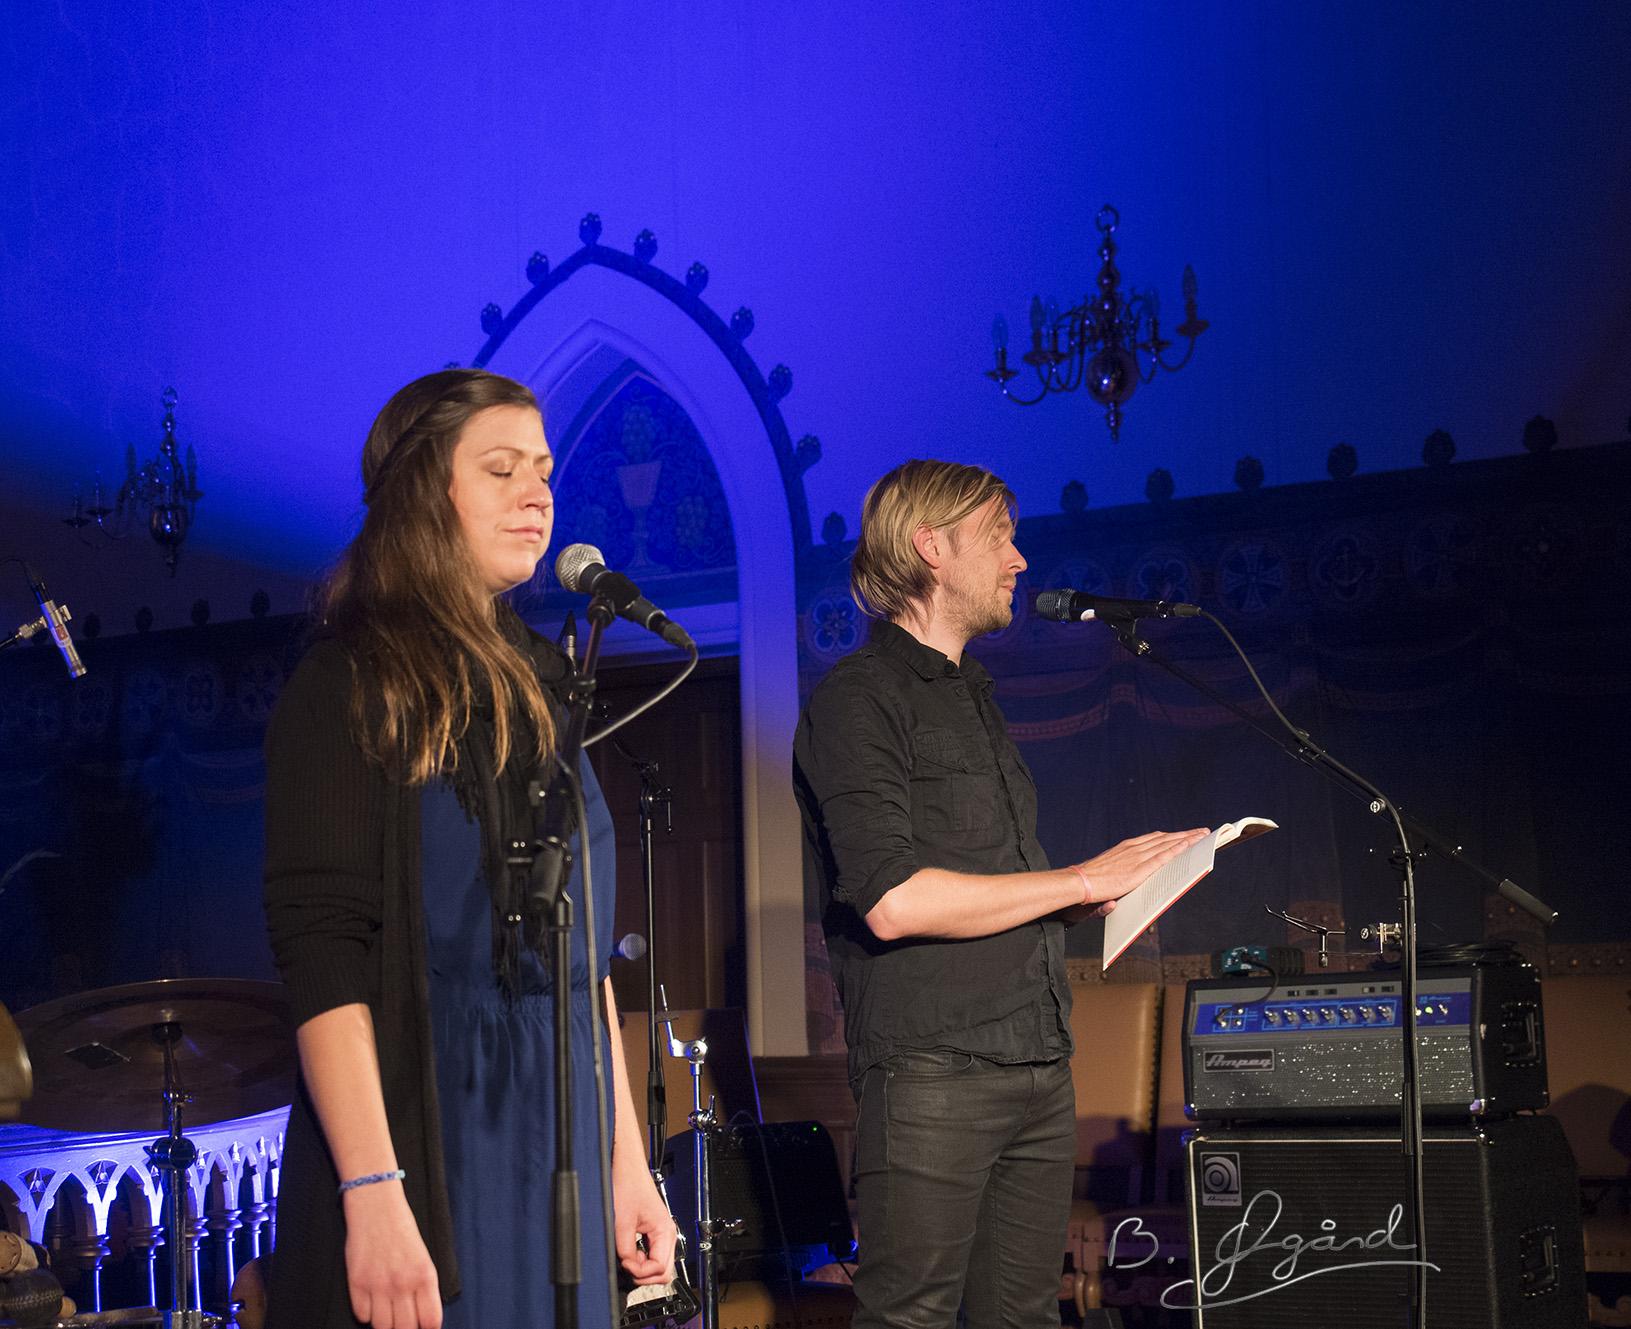 Åsmund & Marianne. Album  Trust  can be found on Spotify, Tidal & iTunes. (Photo: Børge Øgård)